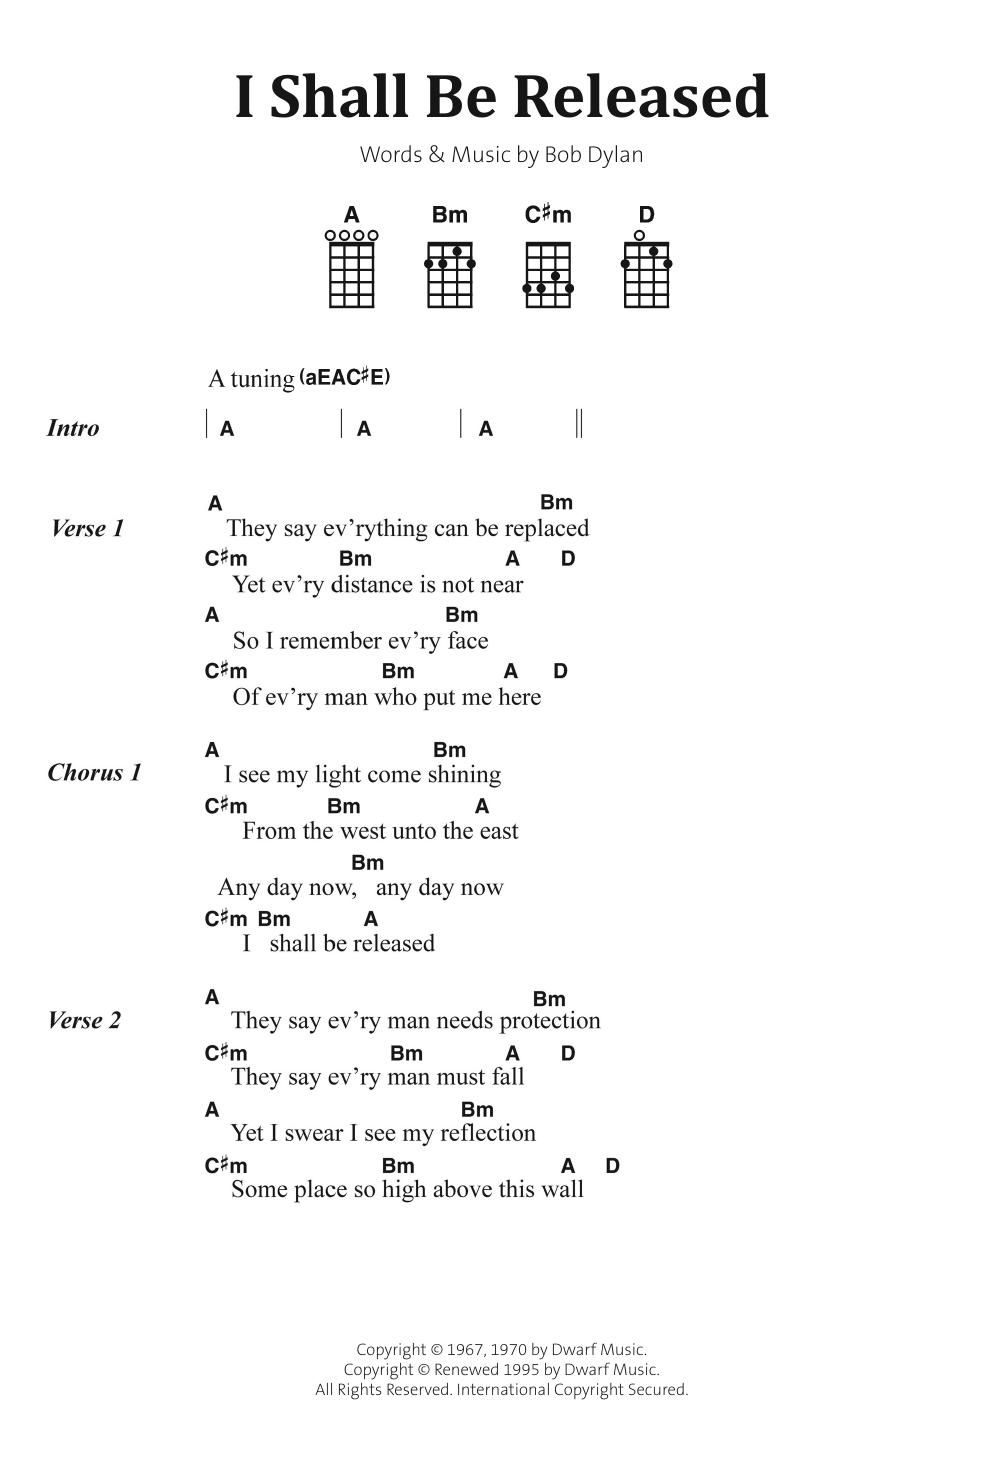 Sheet music digital files to print licensed bob dylan digital sheet music digital by merriam music hexwebz Images